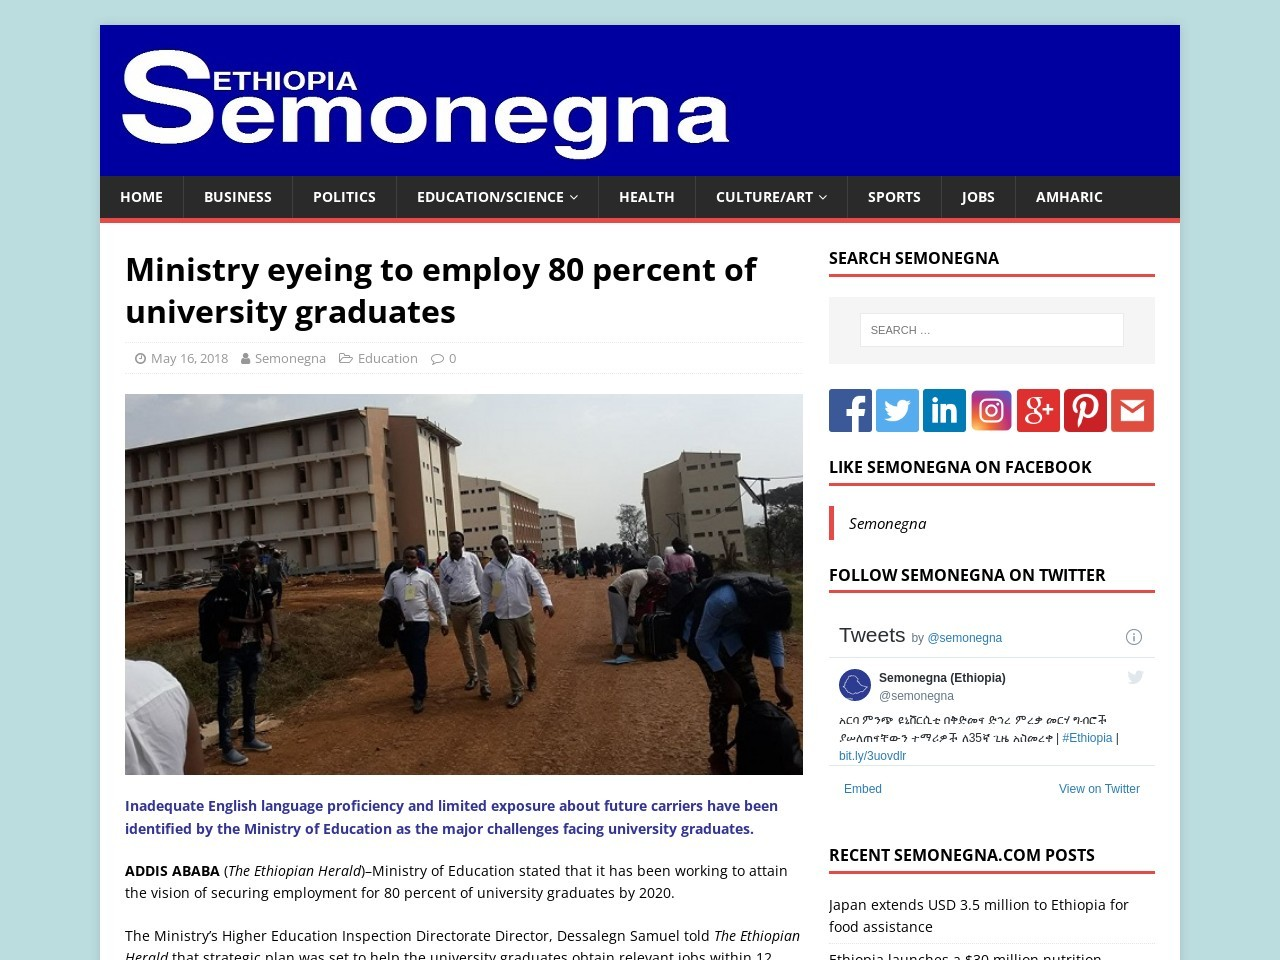 Ministry eyeing to employ 80 percent of university graduates